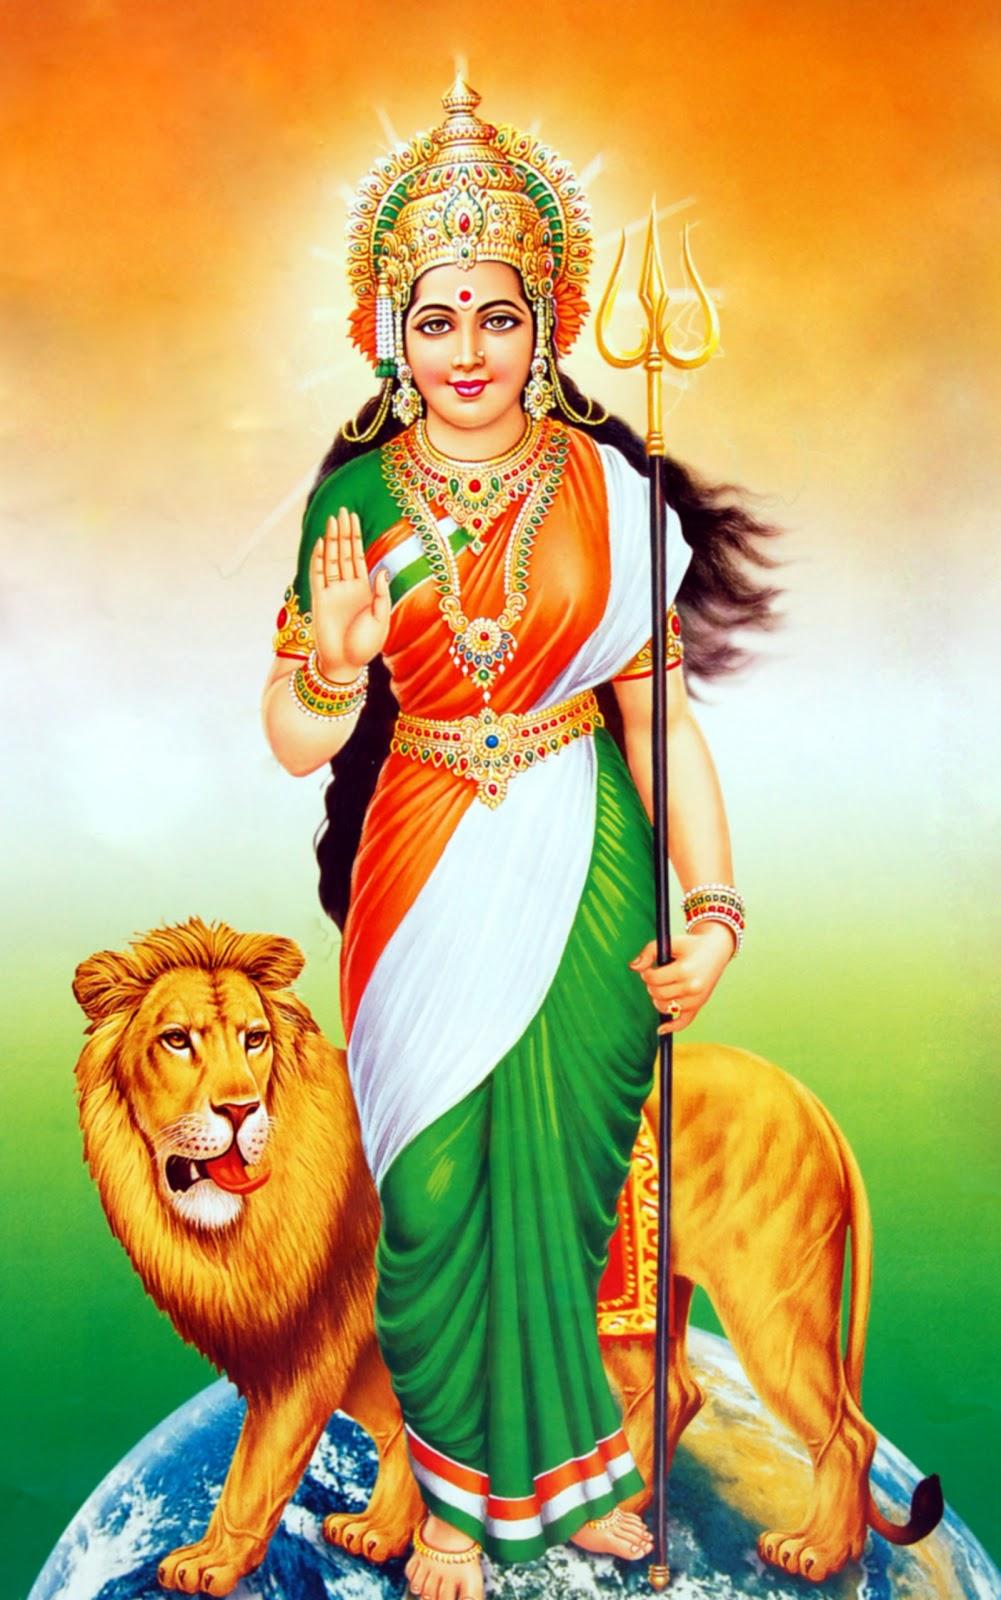 bharat mata with rss flag - photo #29